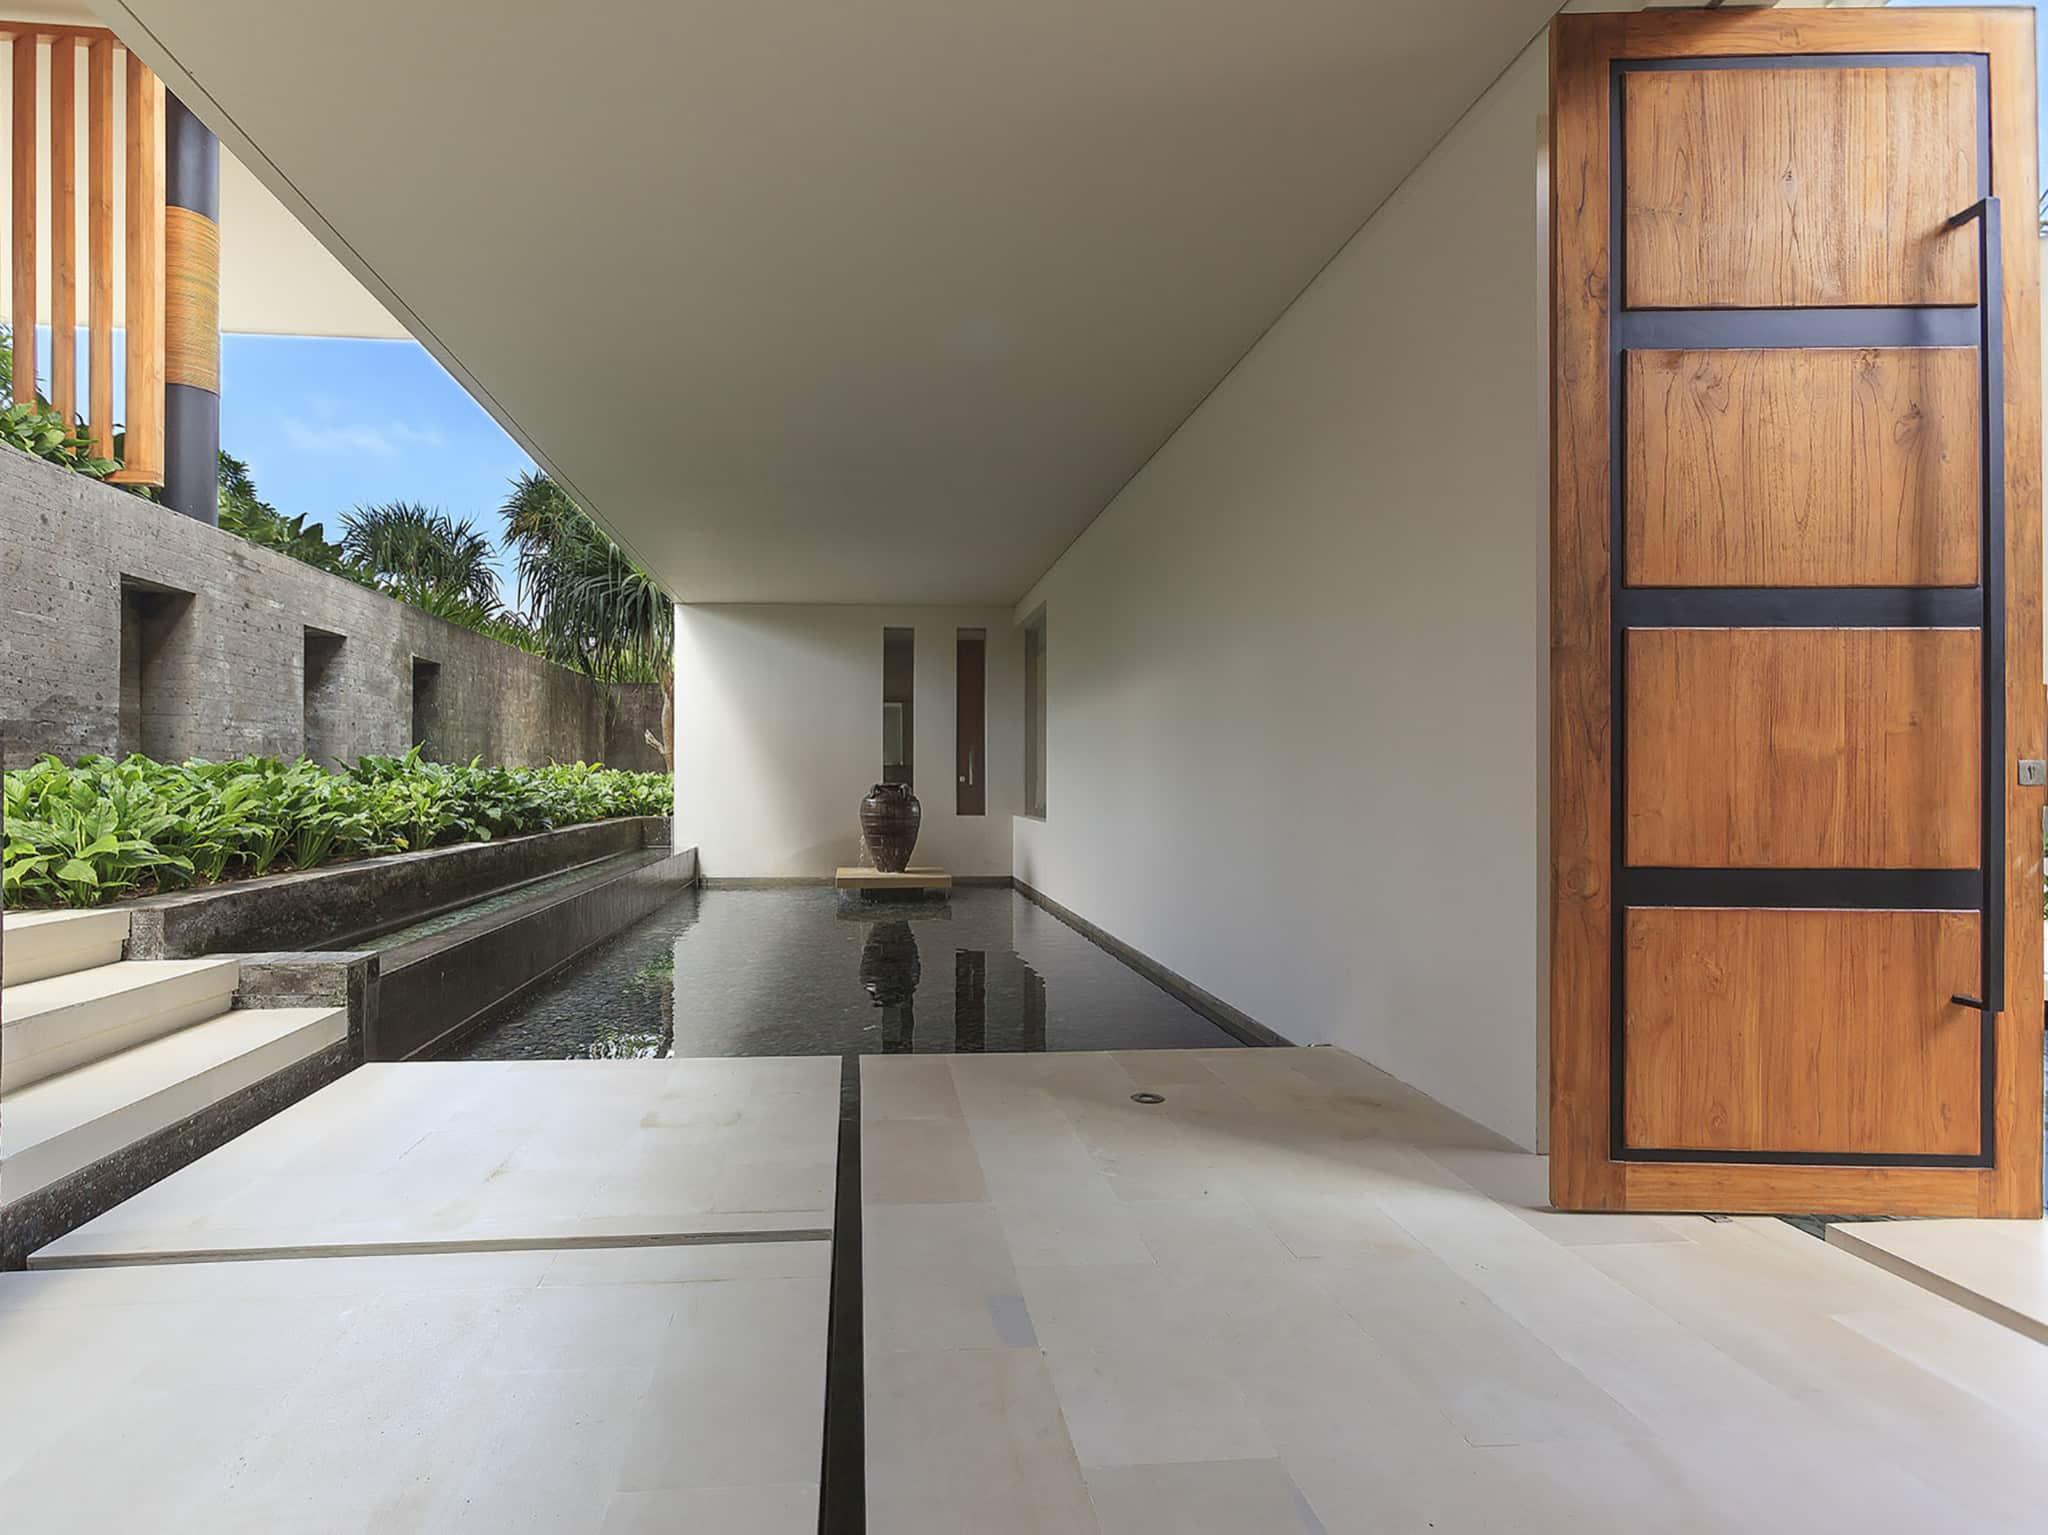 The Iman Villa - Canggu Bali - Stunning entrance water feature